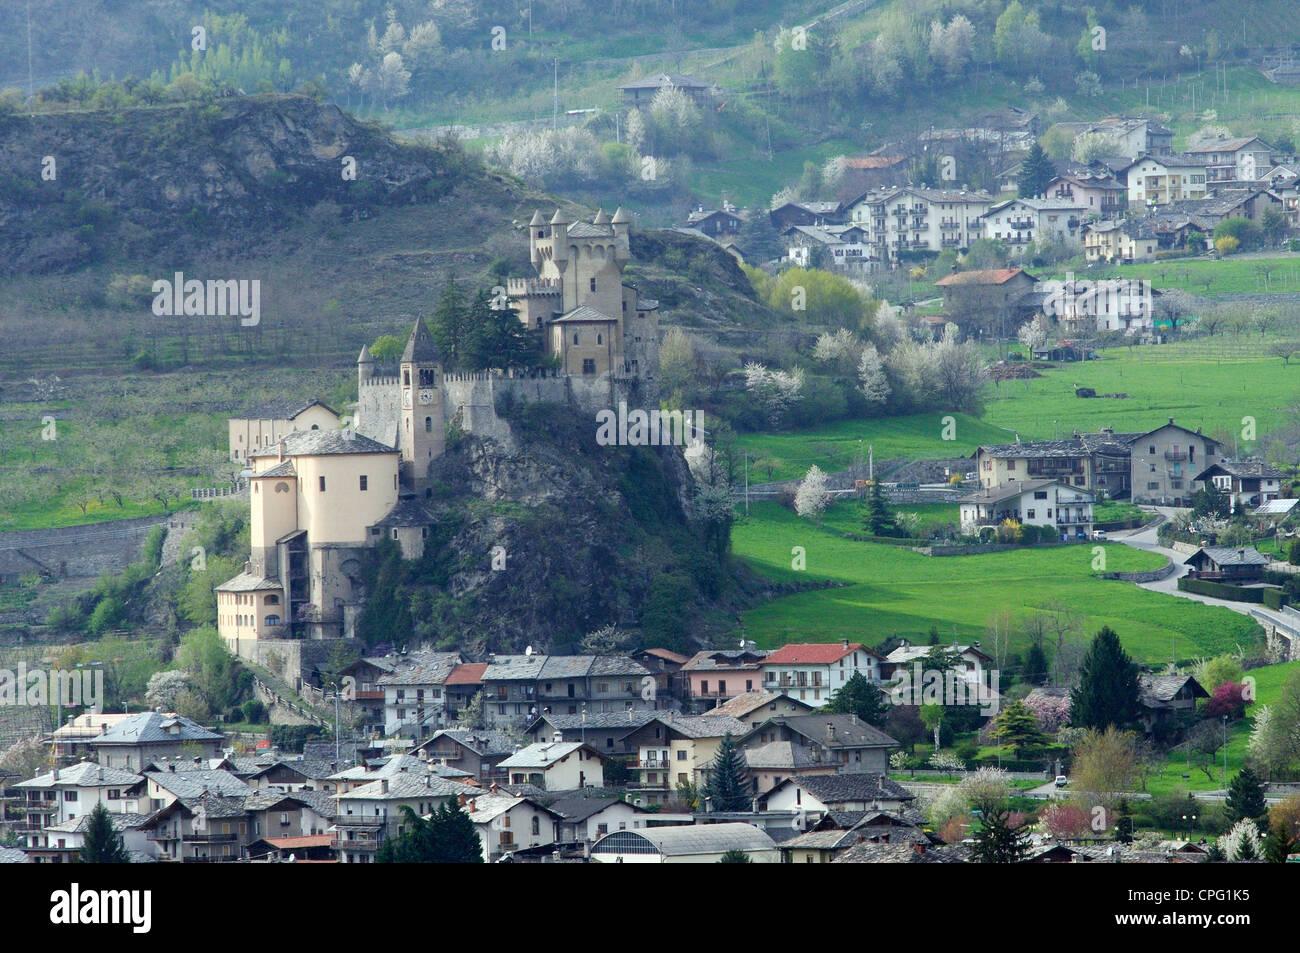 Italy, Aosta Valley, Saint-Pierre, Castle - Stock Image